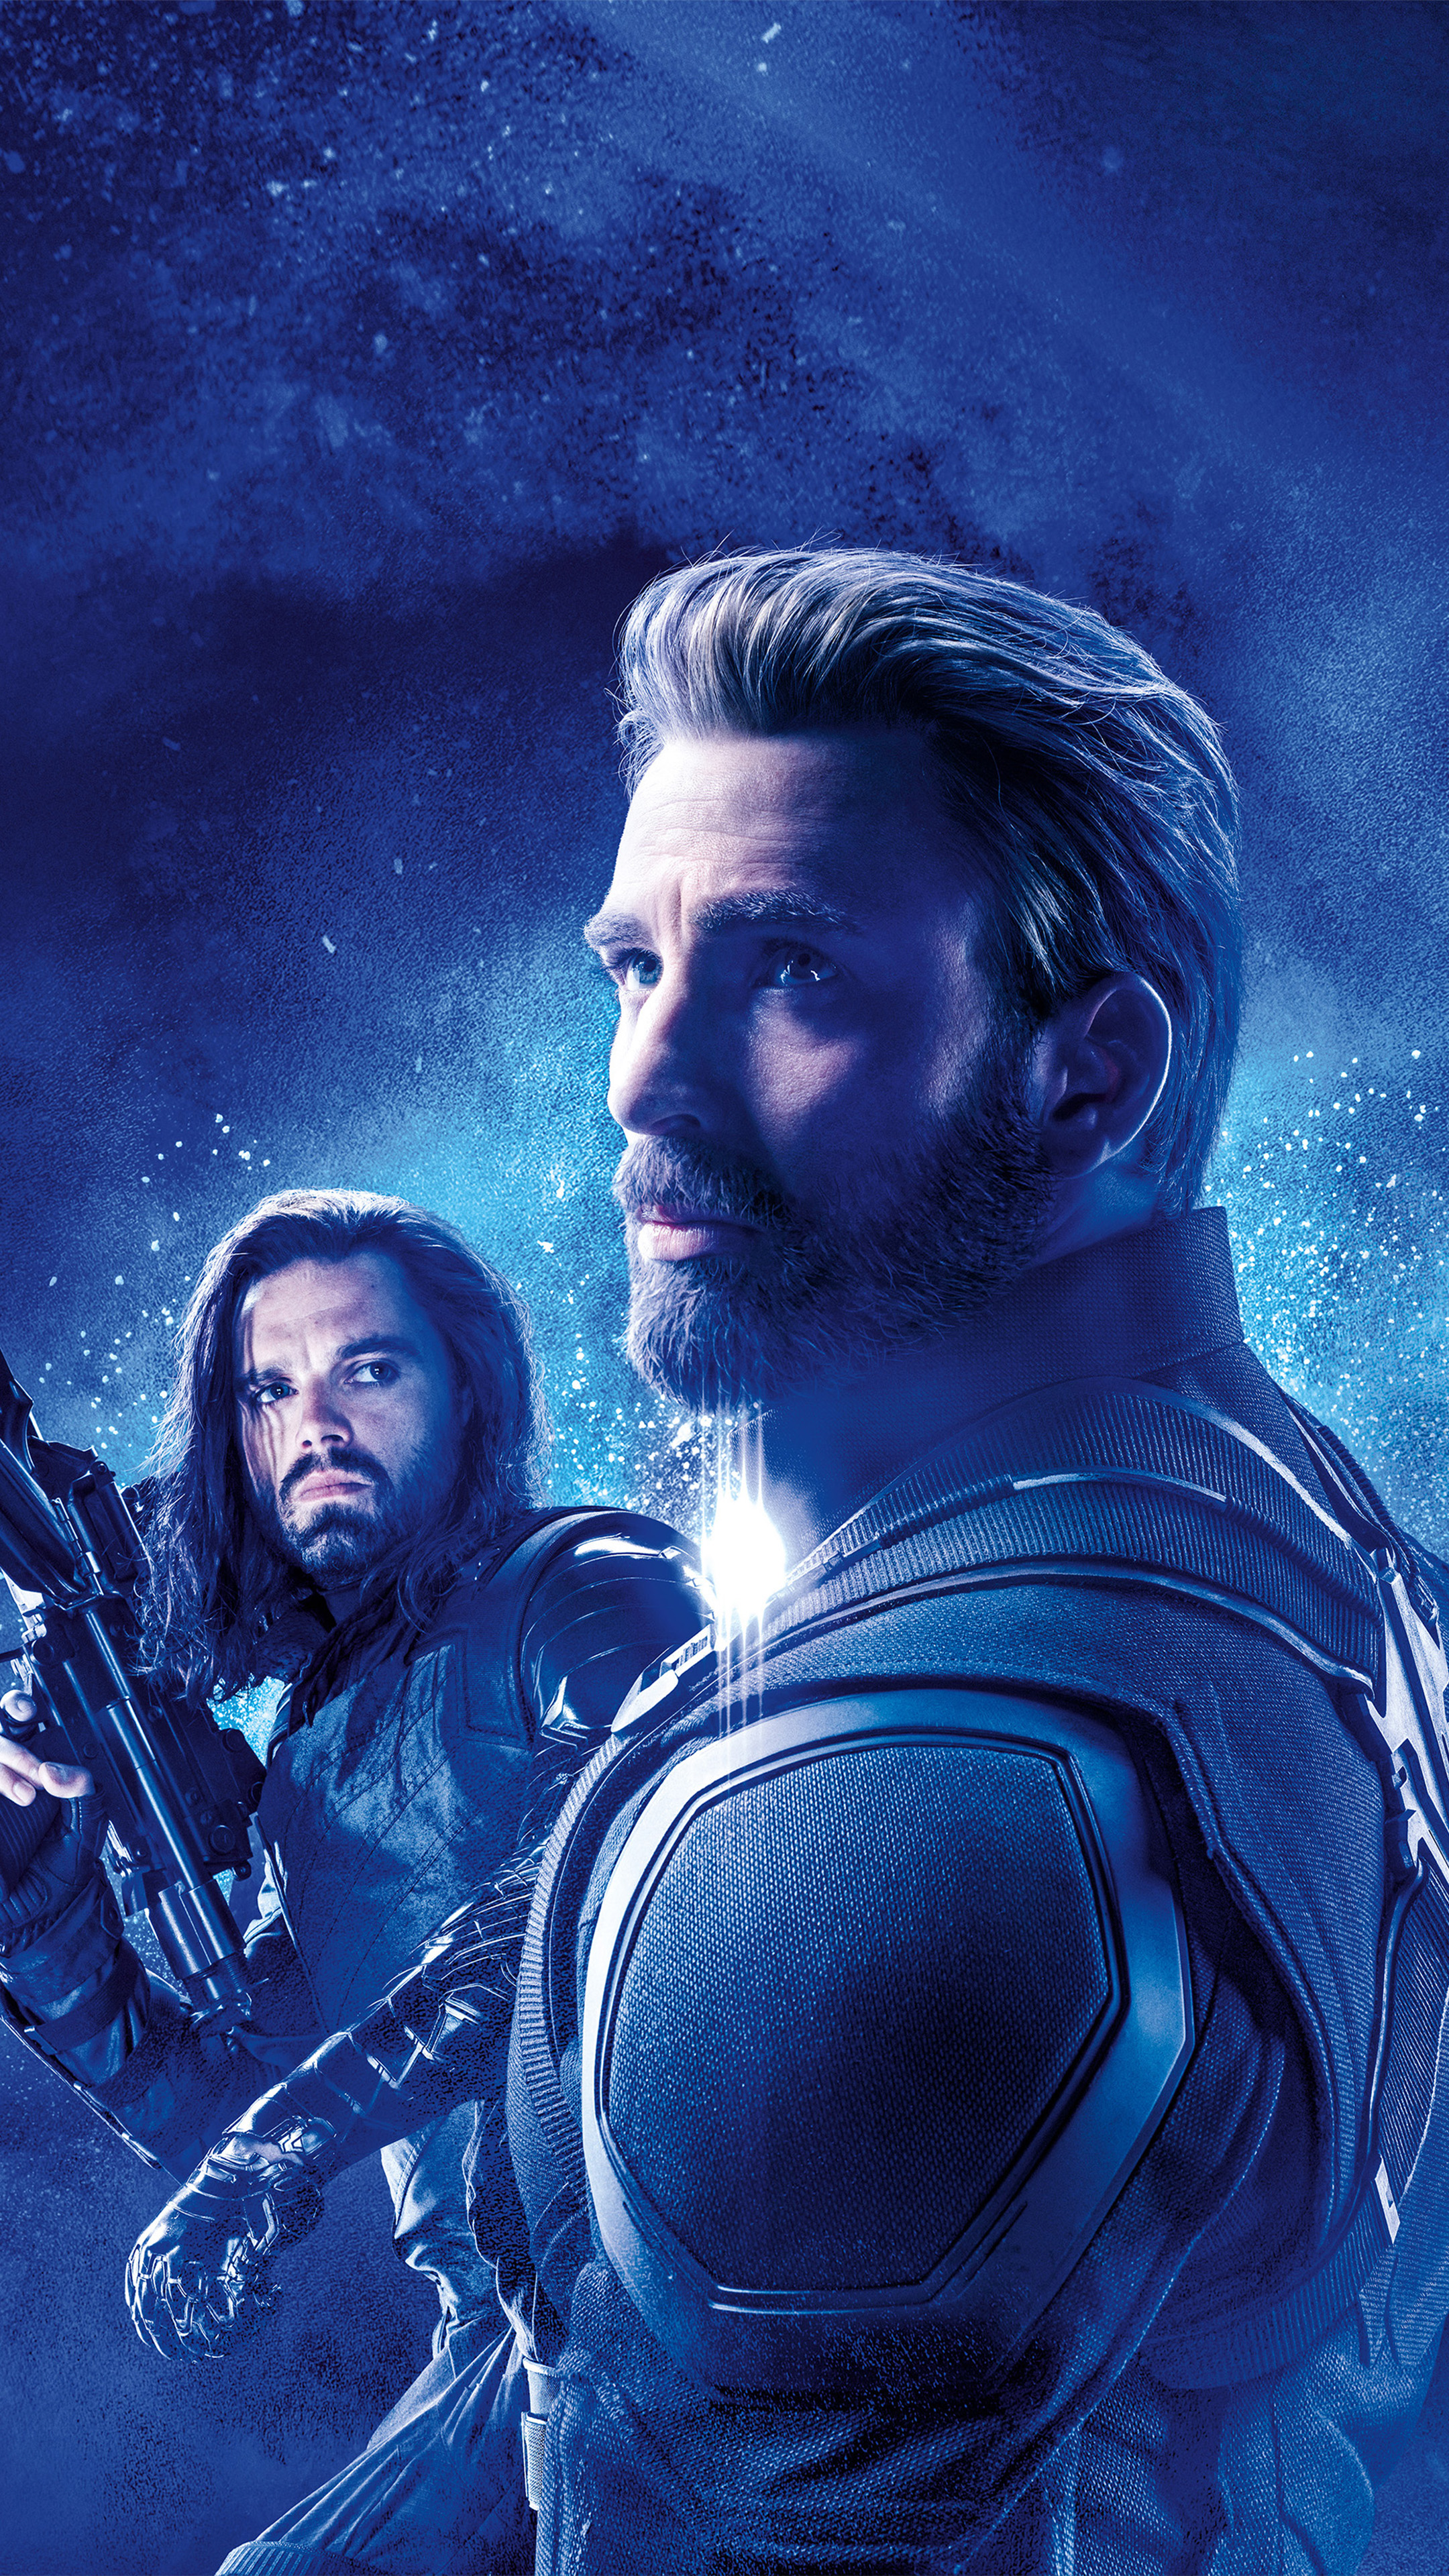 Download Captain America Bucky Barnes In Avengers Endgame Free